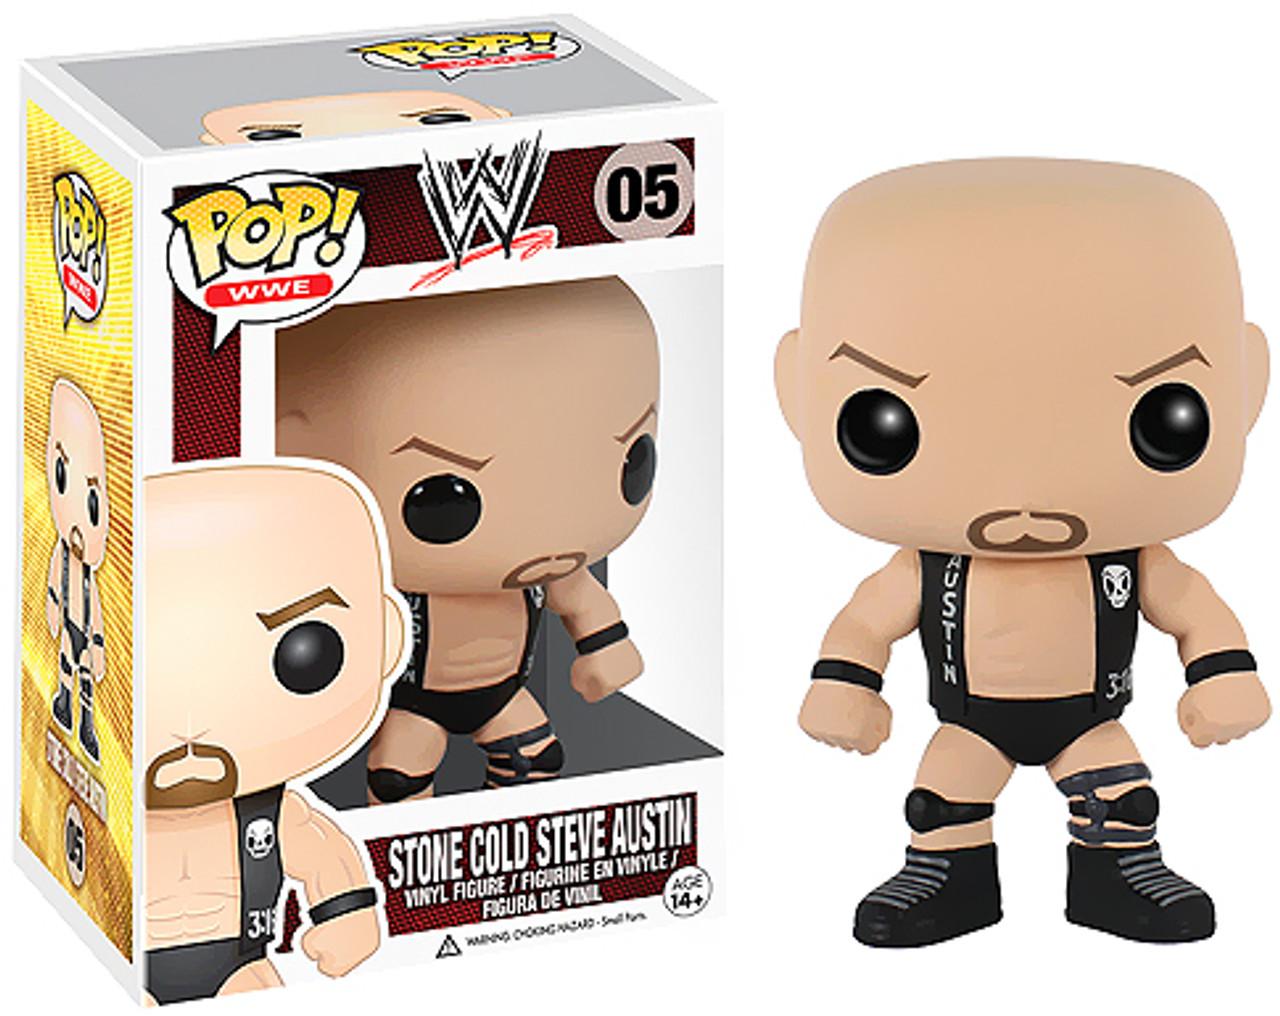 WWE Wrestling Funko POP! Stone Cold Steve Austin Vinyl Figure #05